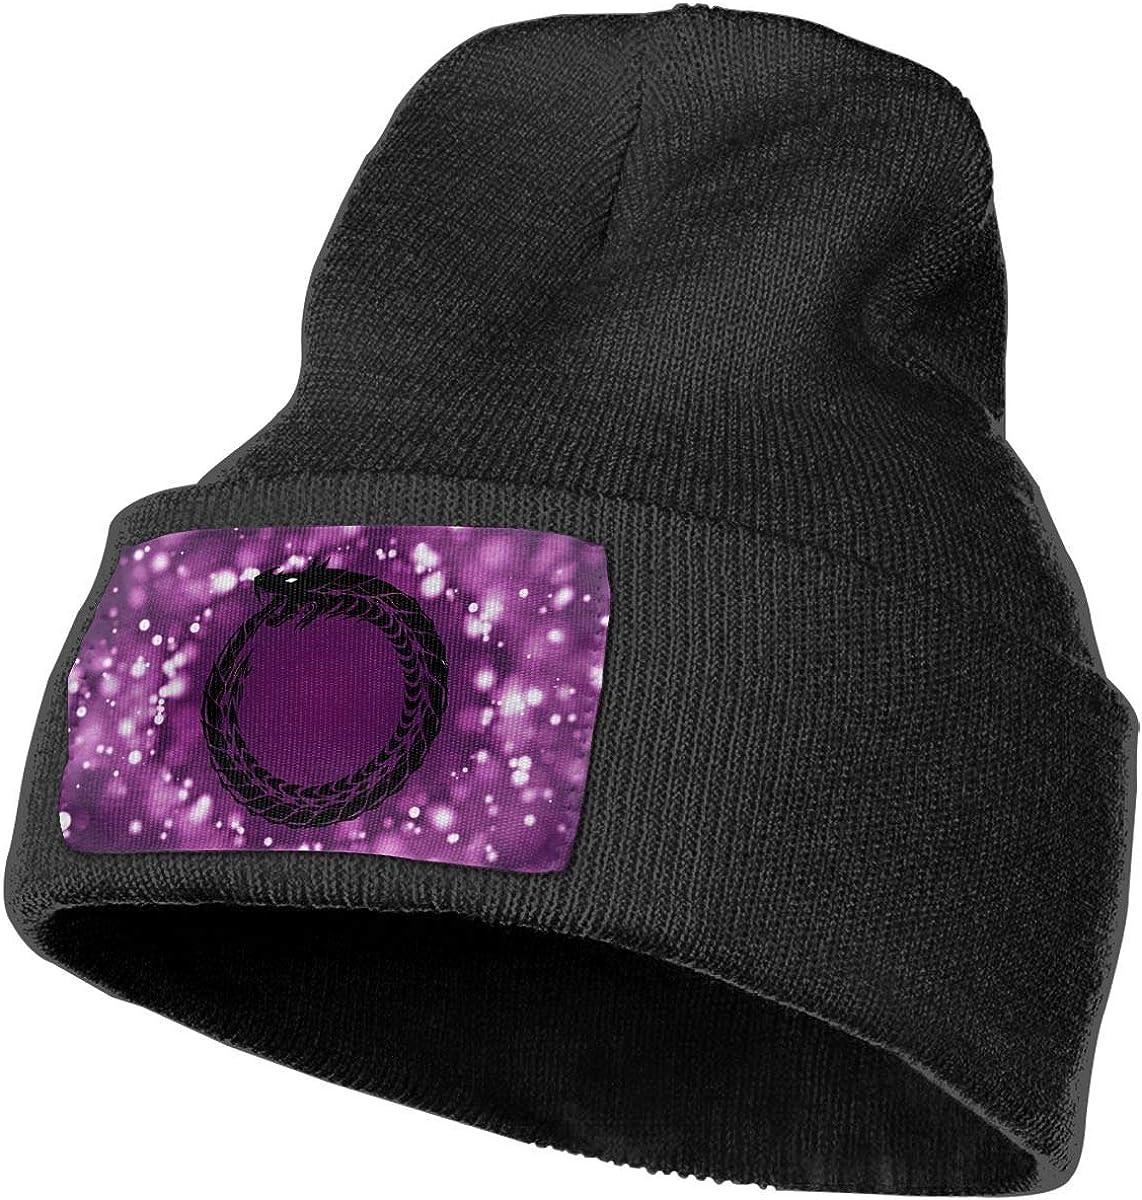 Ouroboros Men/&Women Warm Winter Knit Plain Beanie Hat Skull Cap Acrylic Knit Cuff Hat